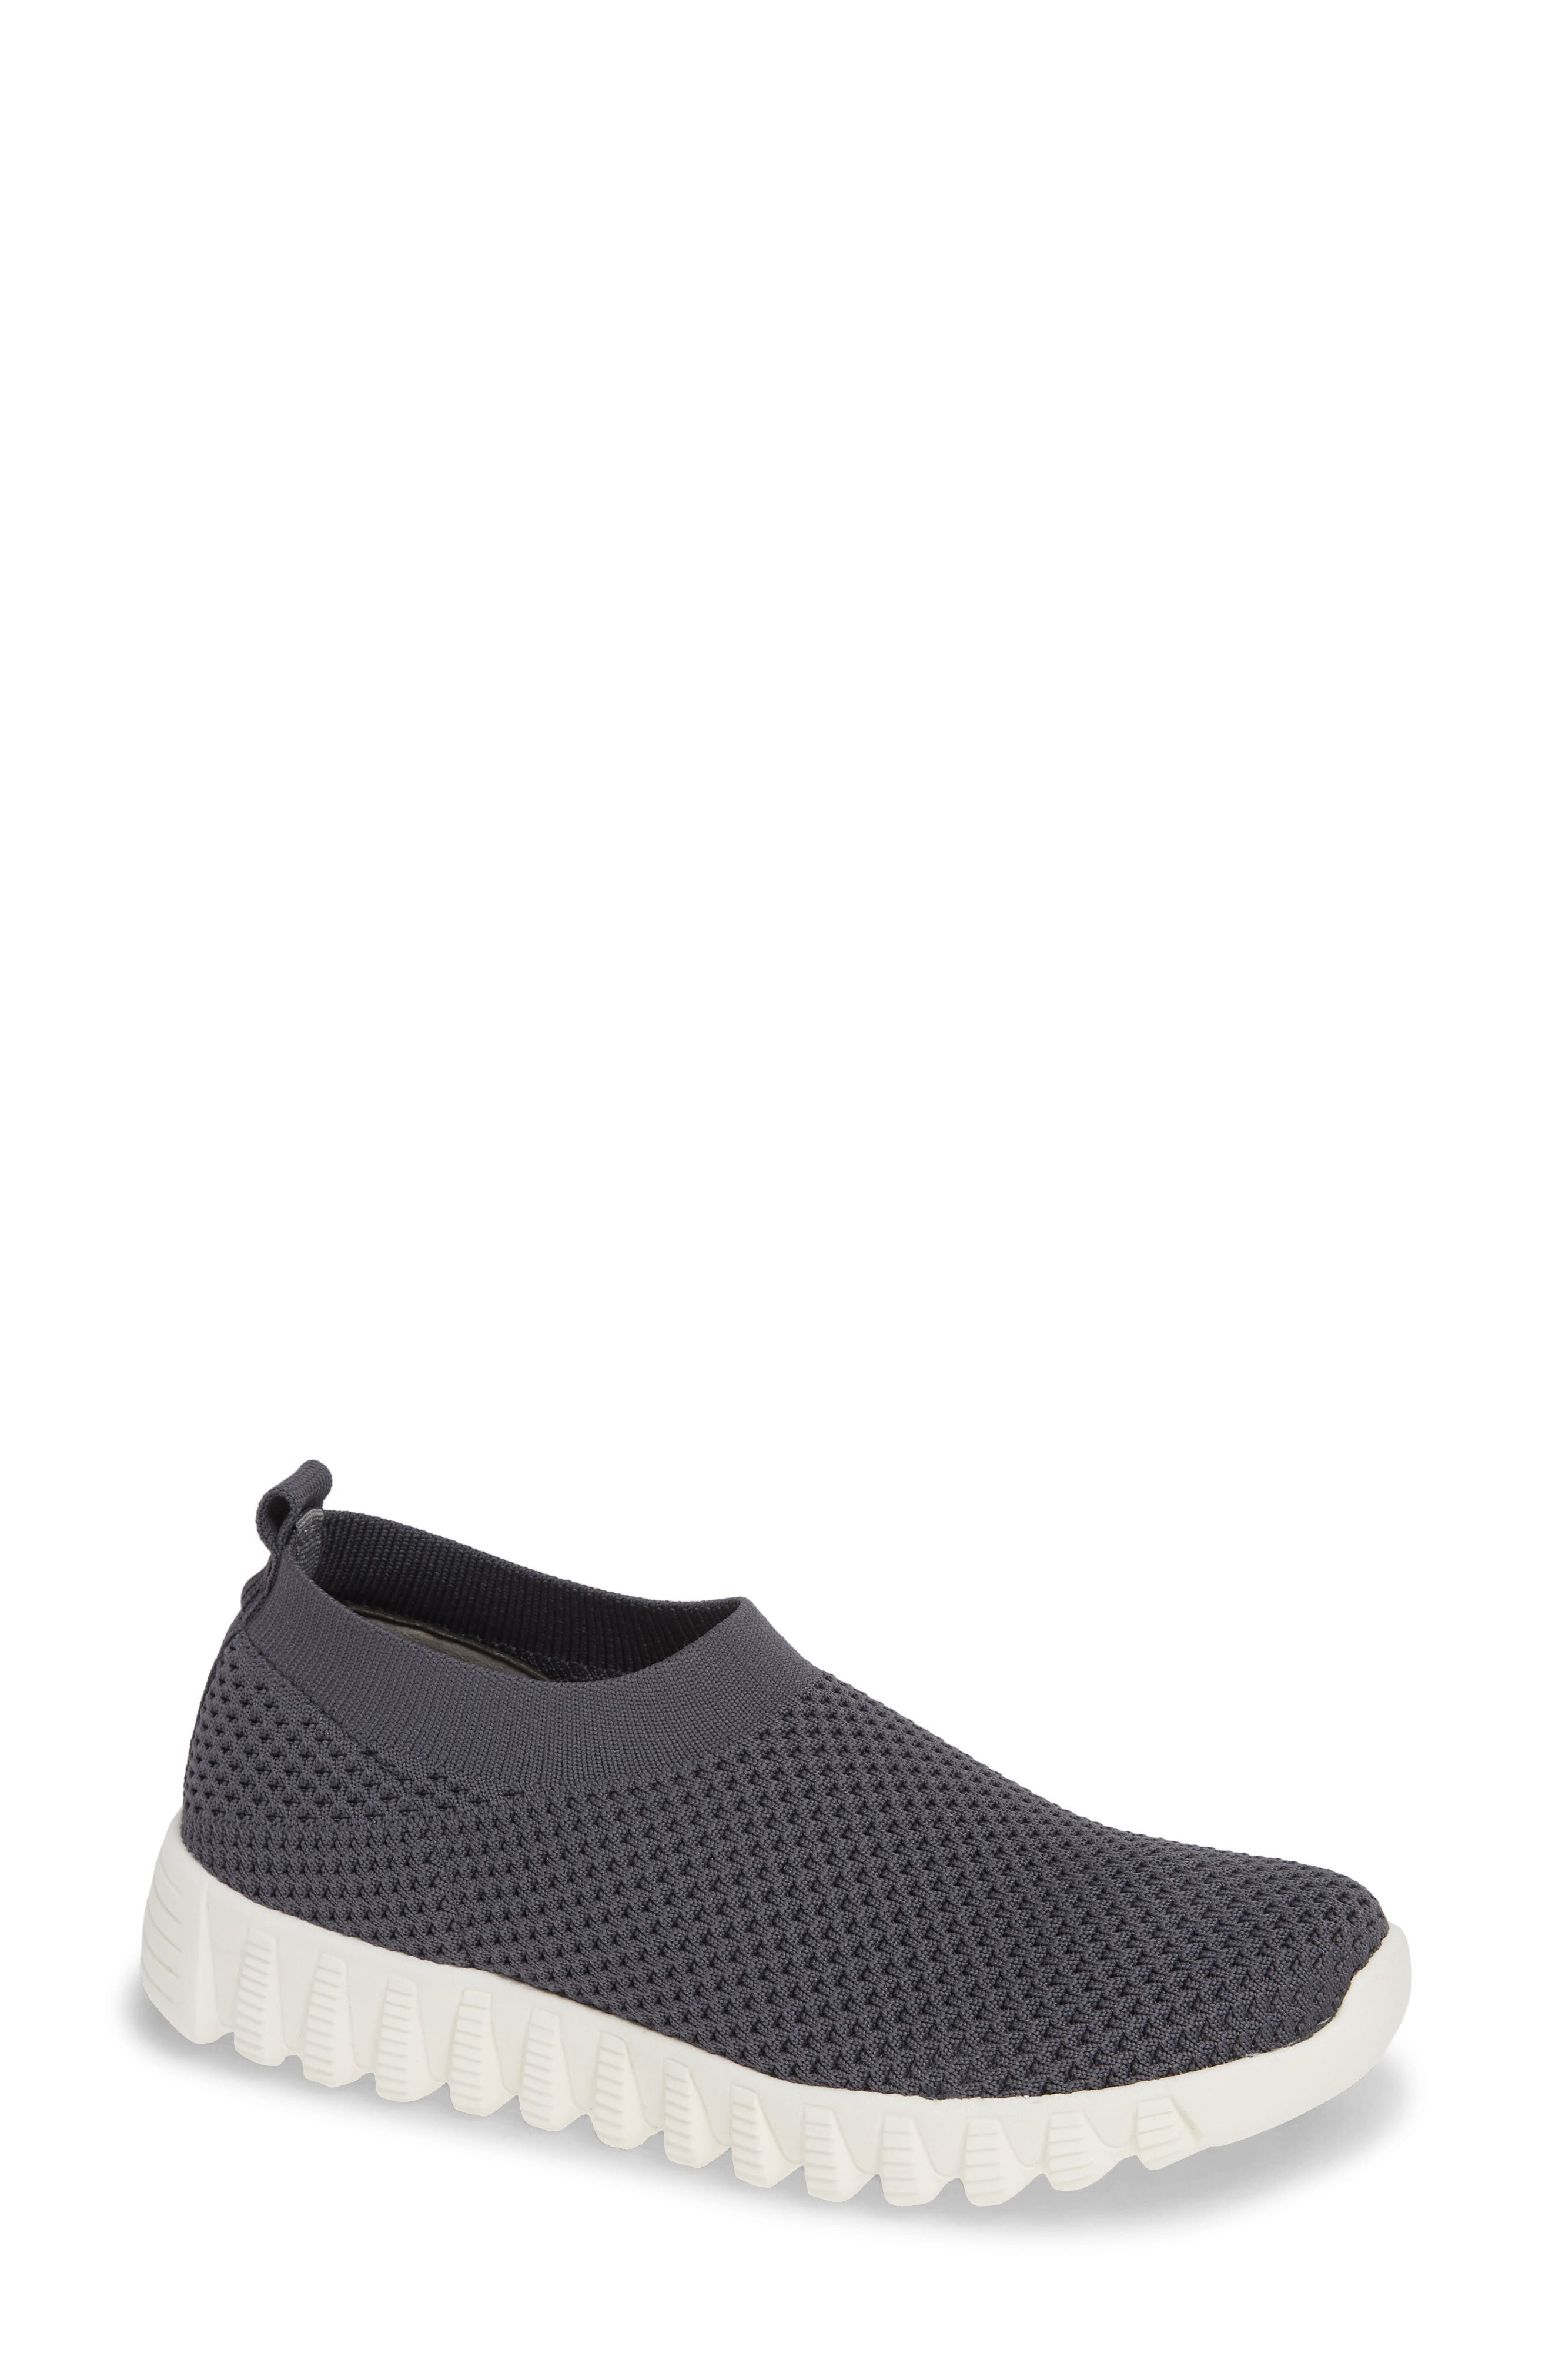 Bernie Mev. Electric Sneaker, Grey